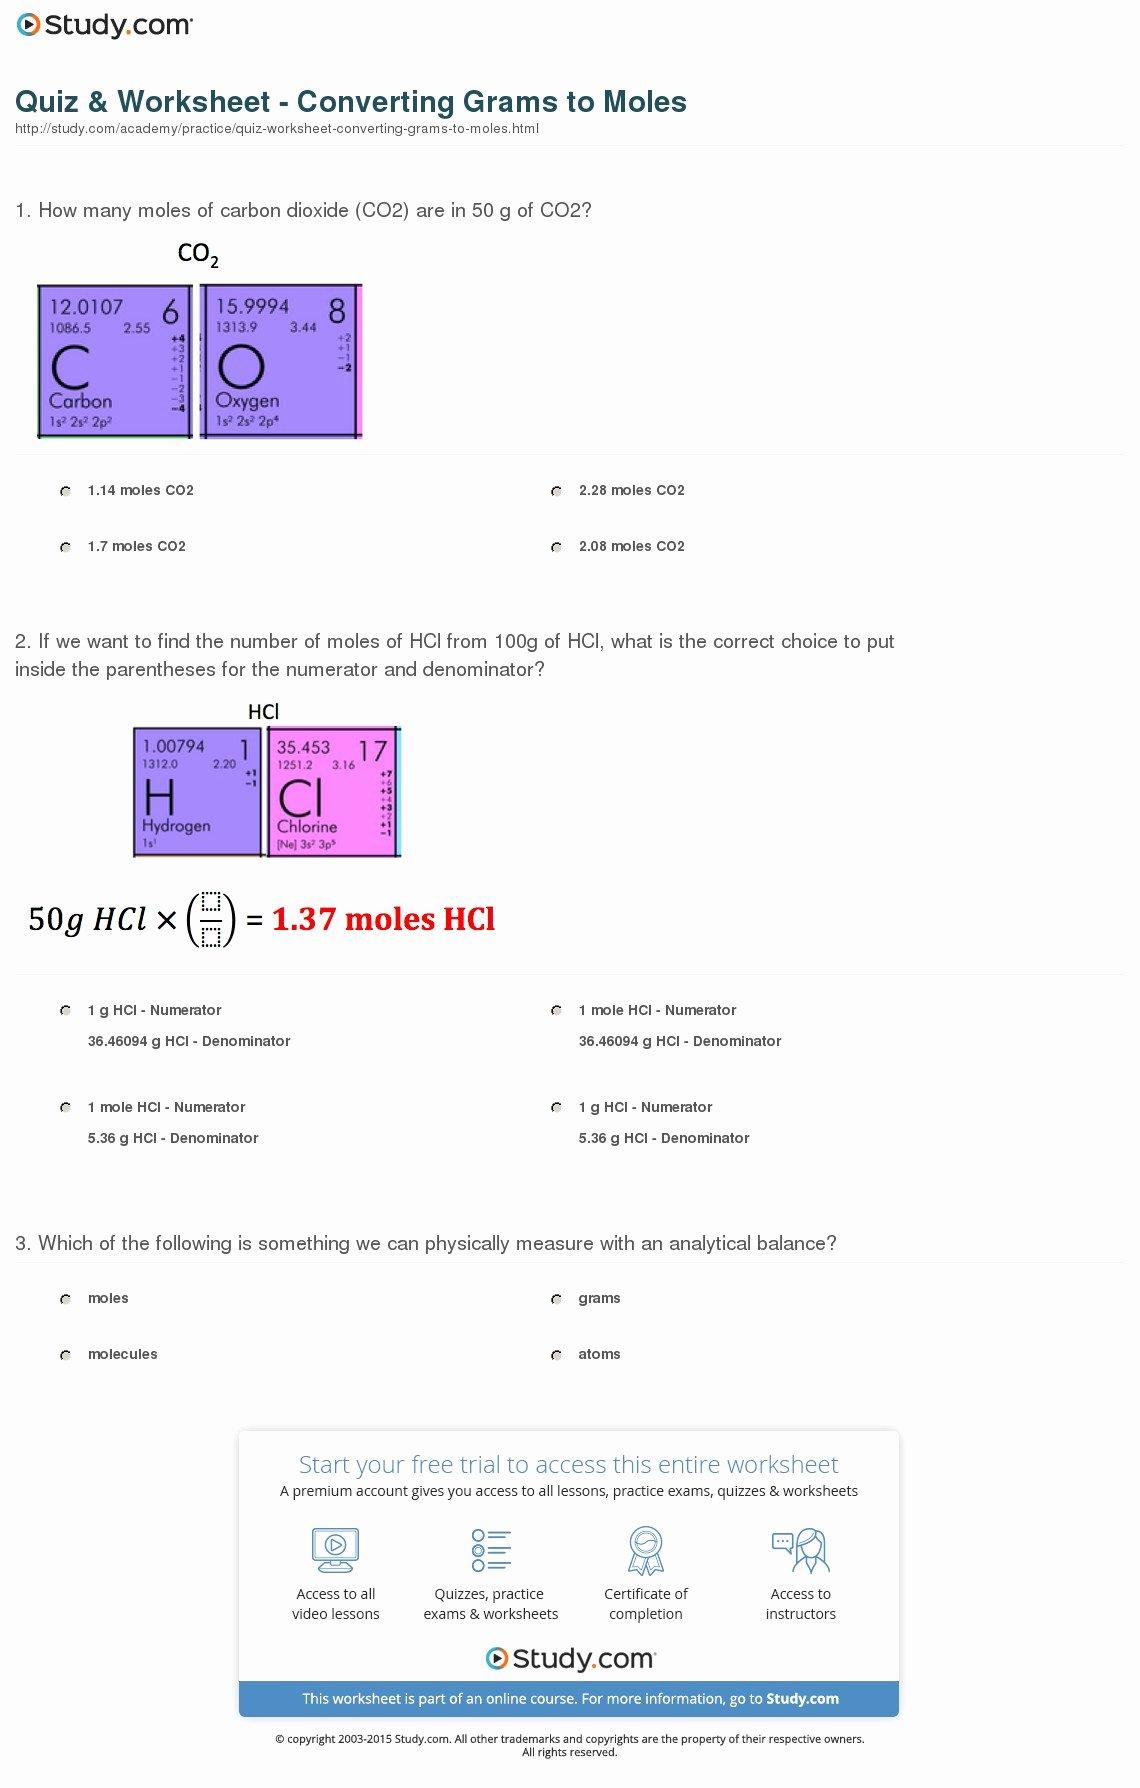 Moles Molecules and Grams Worksheet New Quiz & Worksheet Converting Grams to Moles